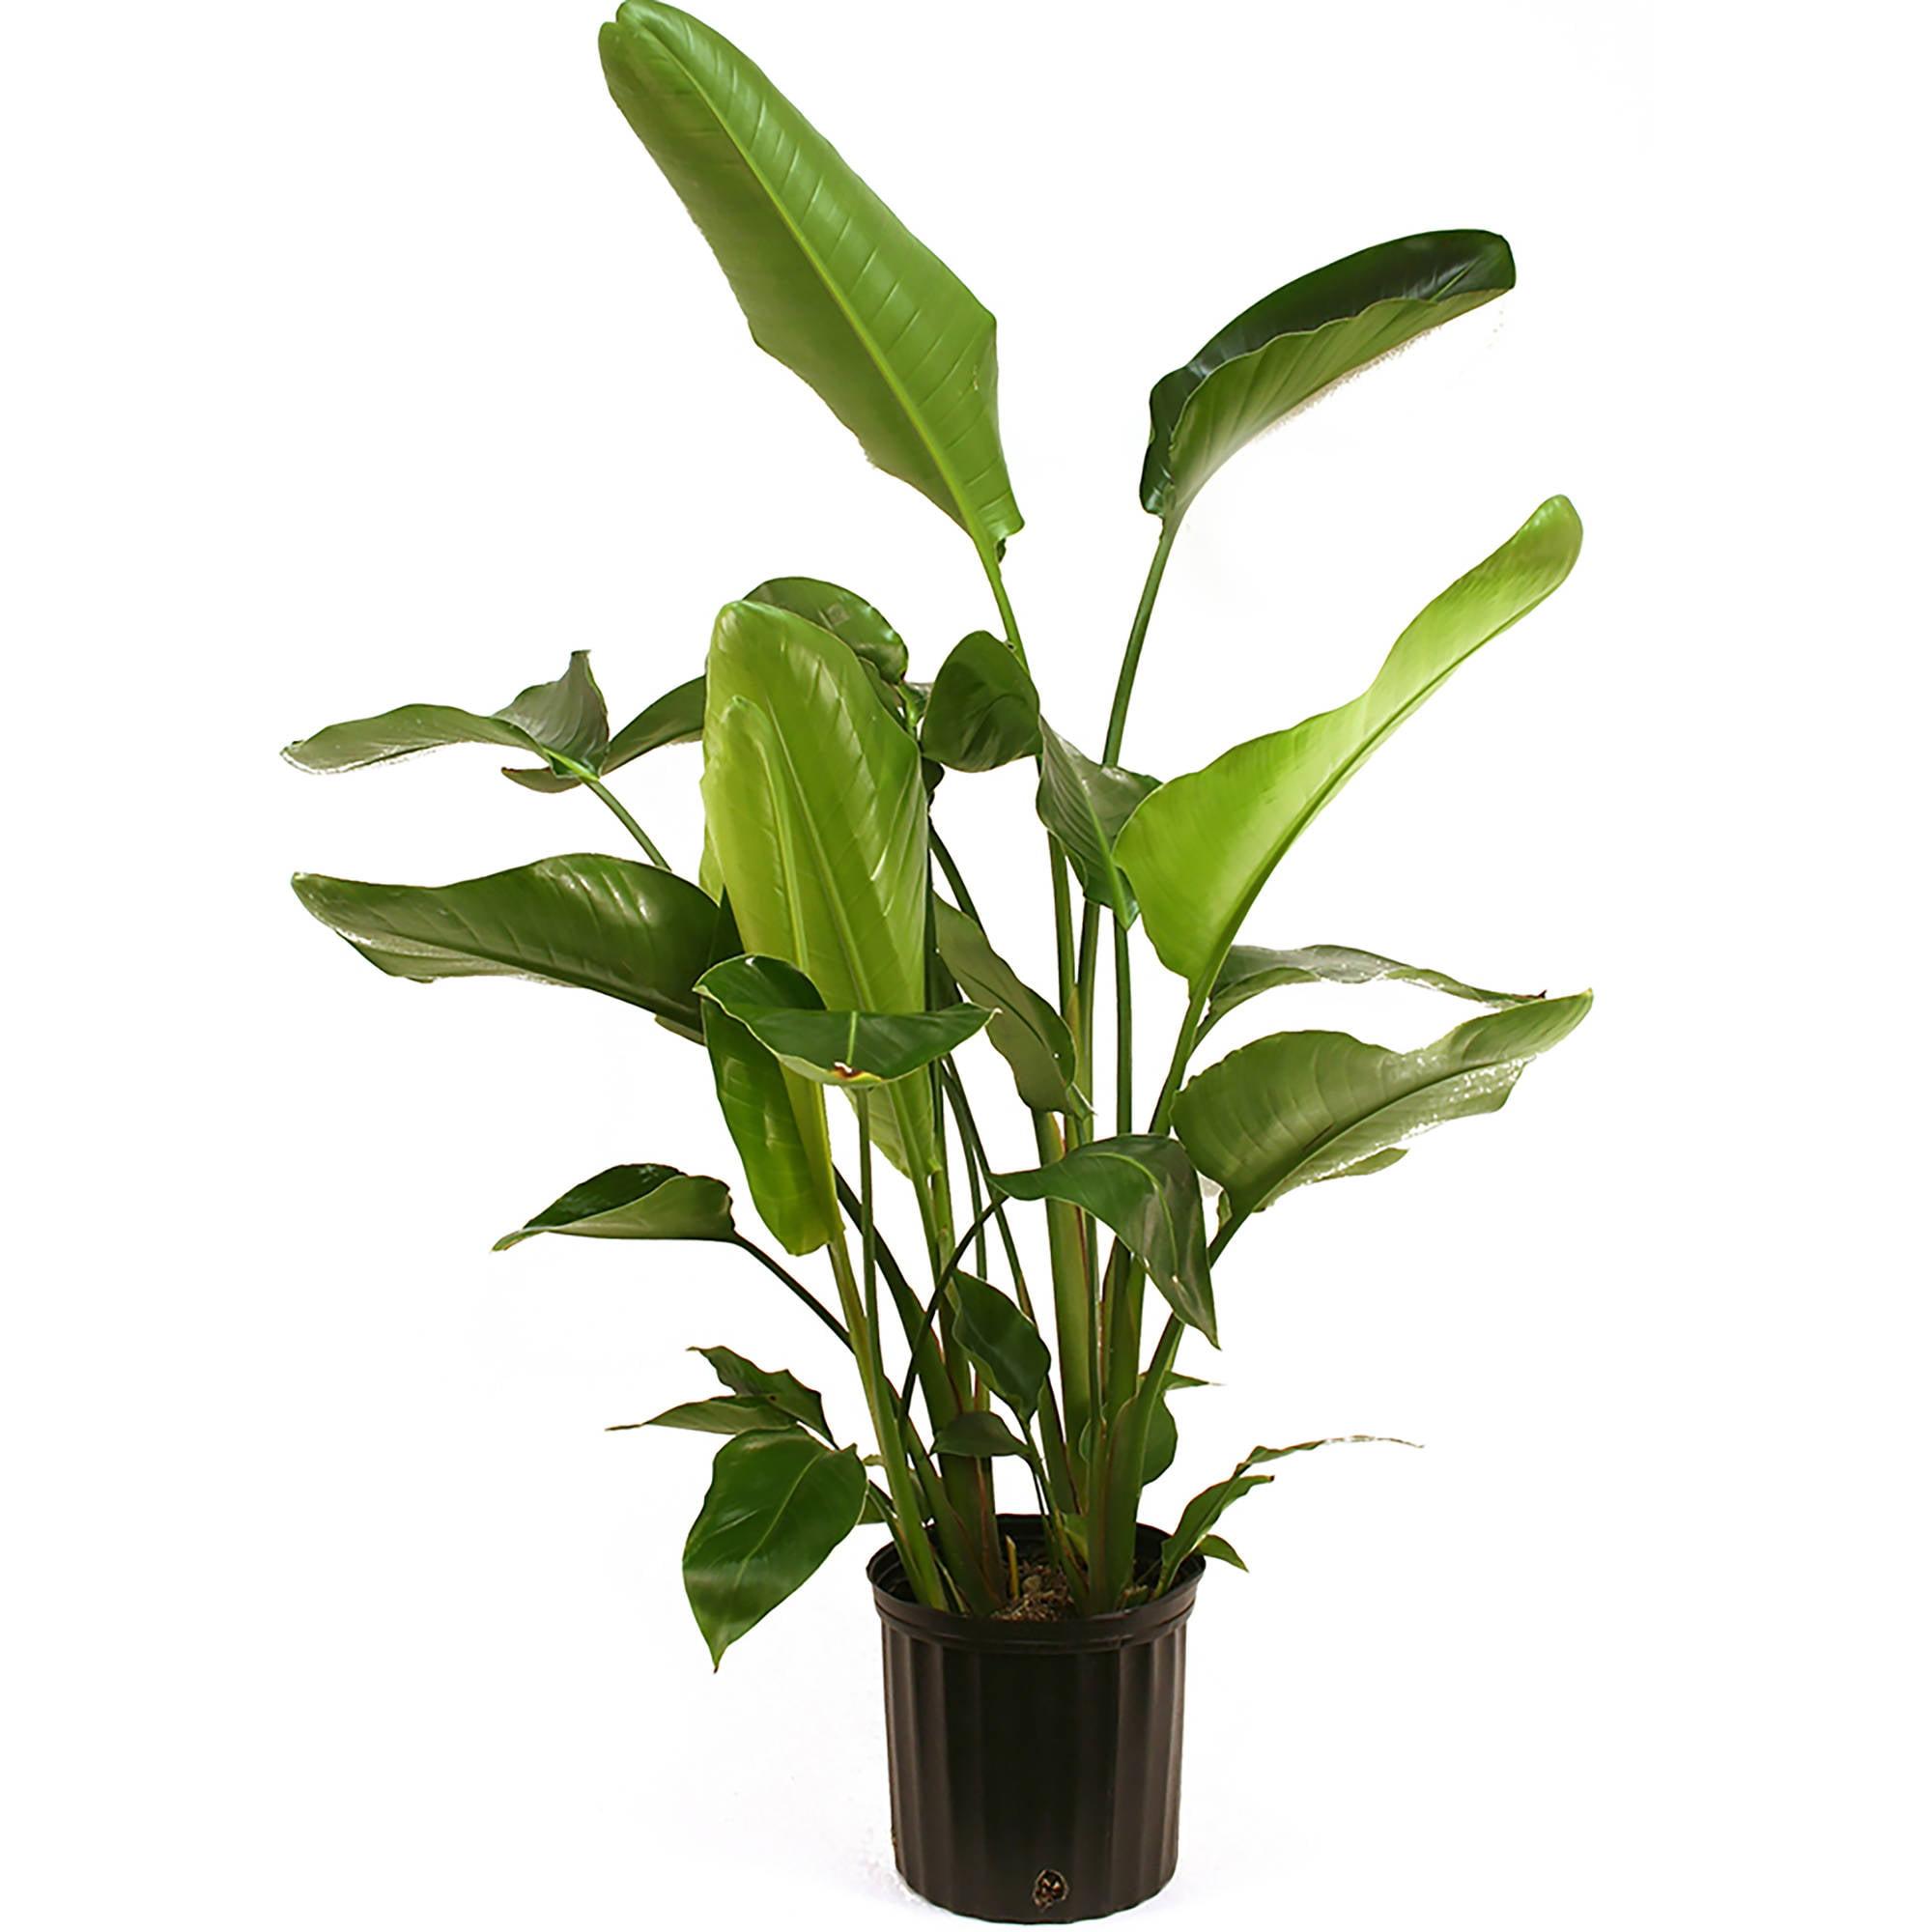 Delray Plants White Bird of Paradise (Strelitzia nicolai) Easy To Grow Live House Plant, 10-inch Grower Pot